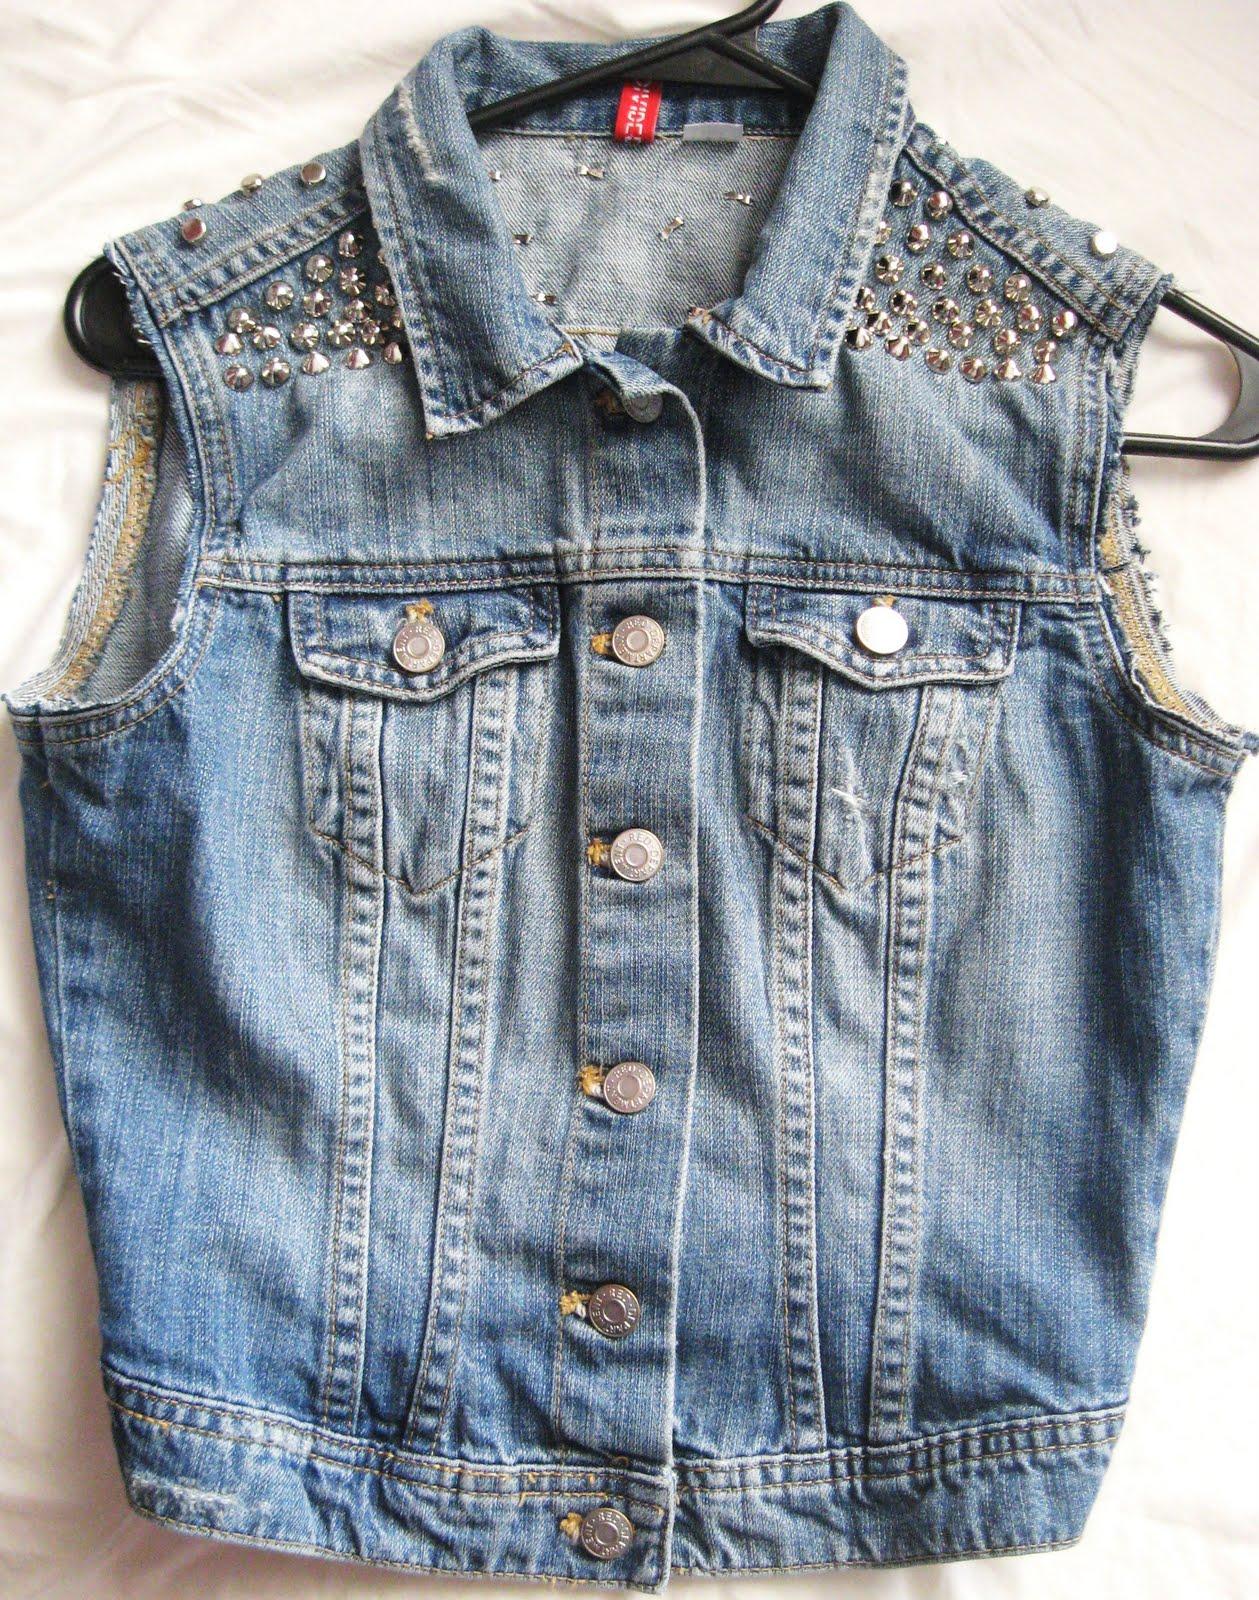 denim jacket outfits tumblr - photo #36